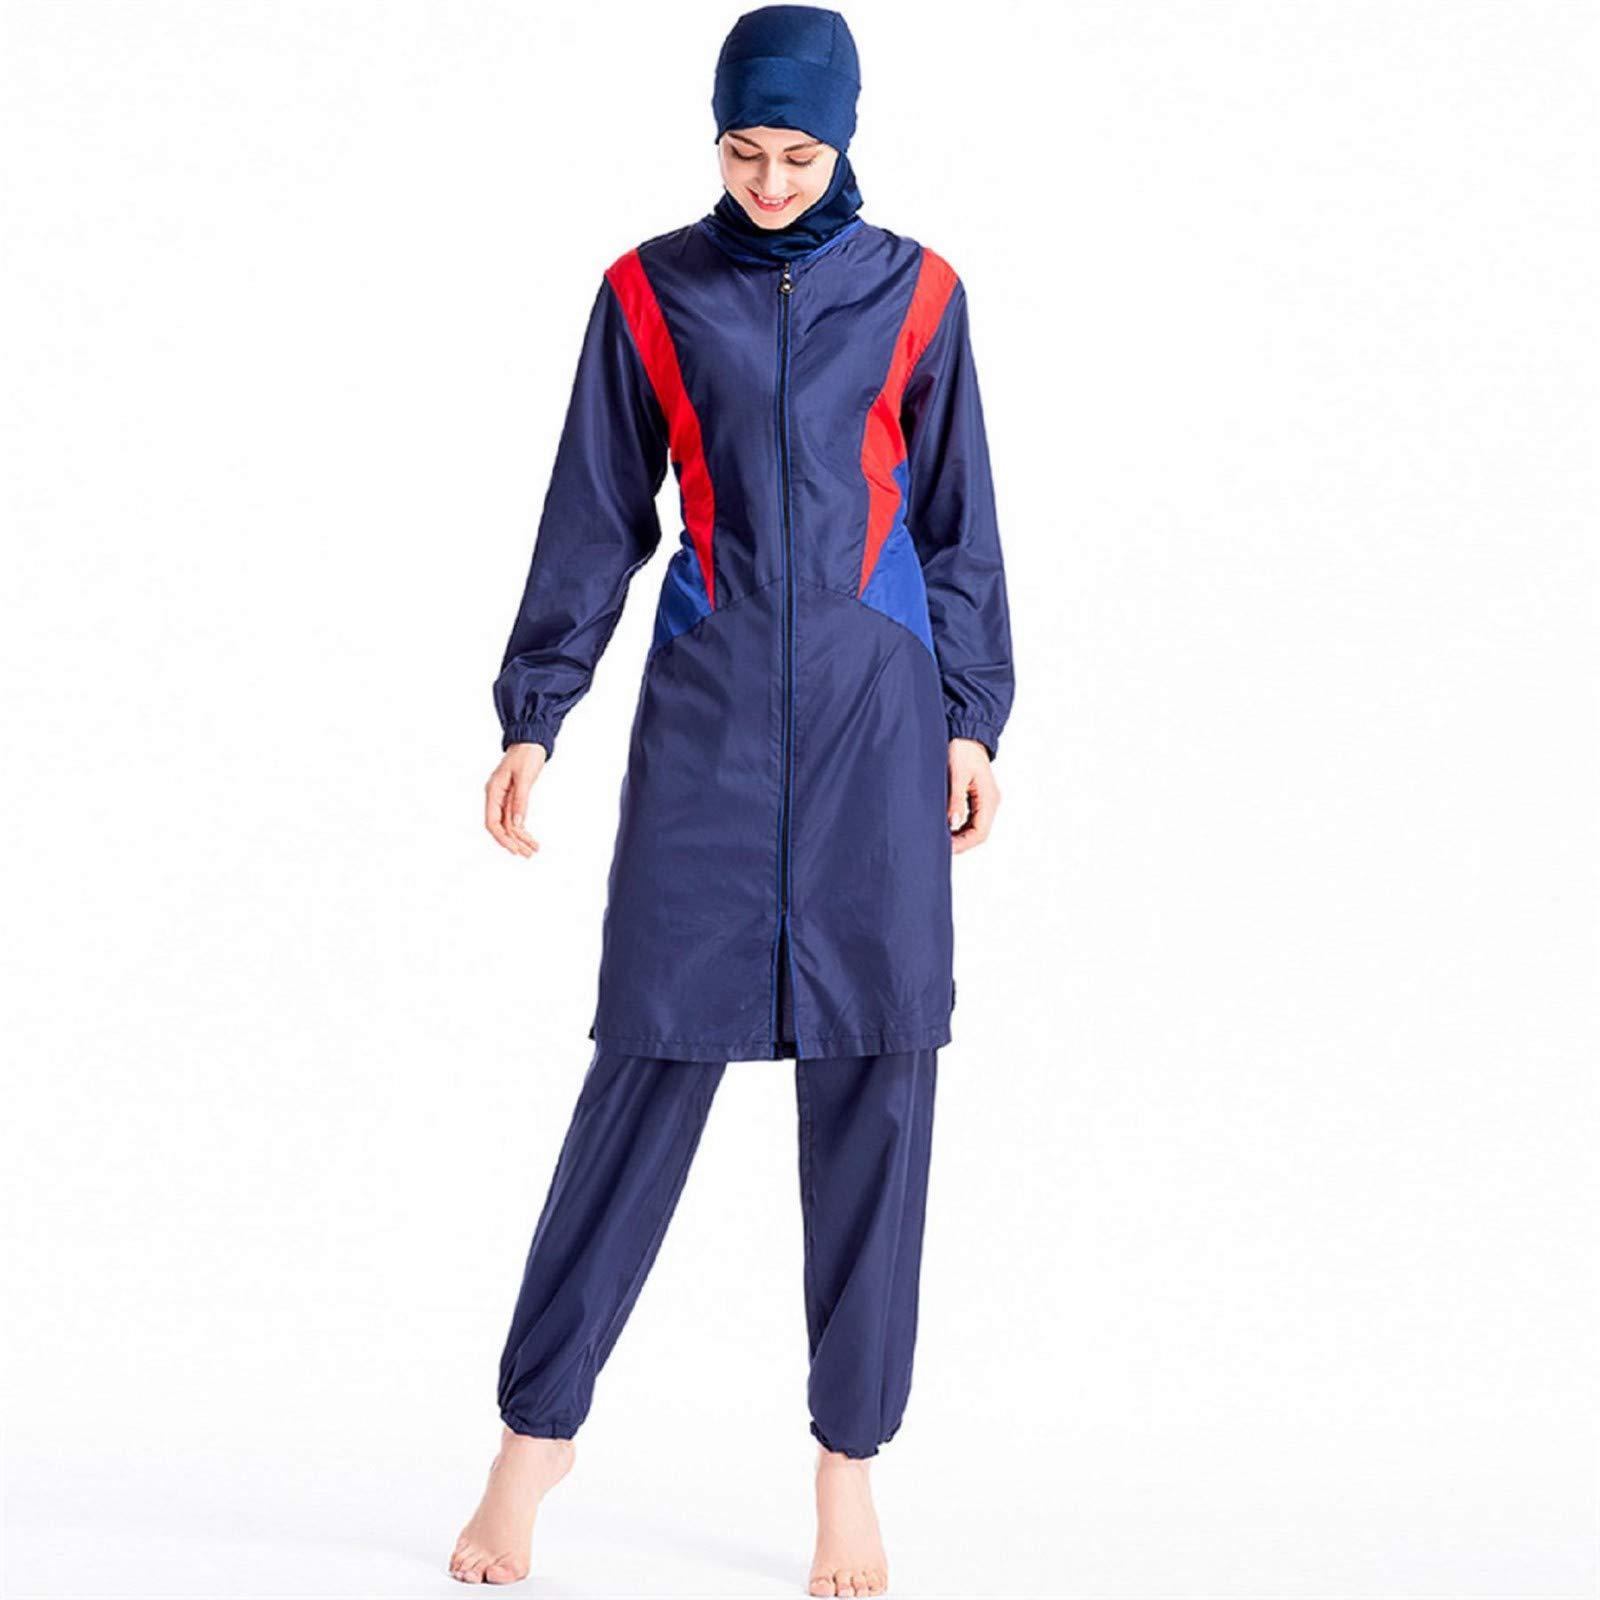 Muslim Swimwear Clothes Women,Women Muslim Bathing Suit + Cap + Pants